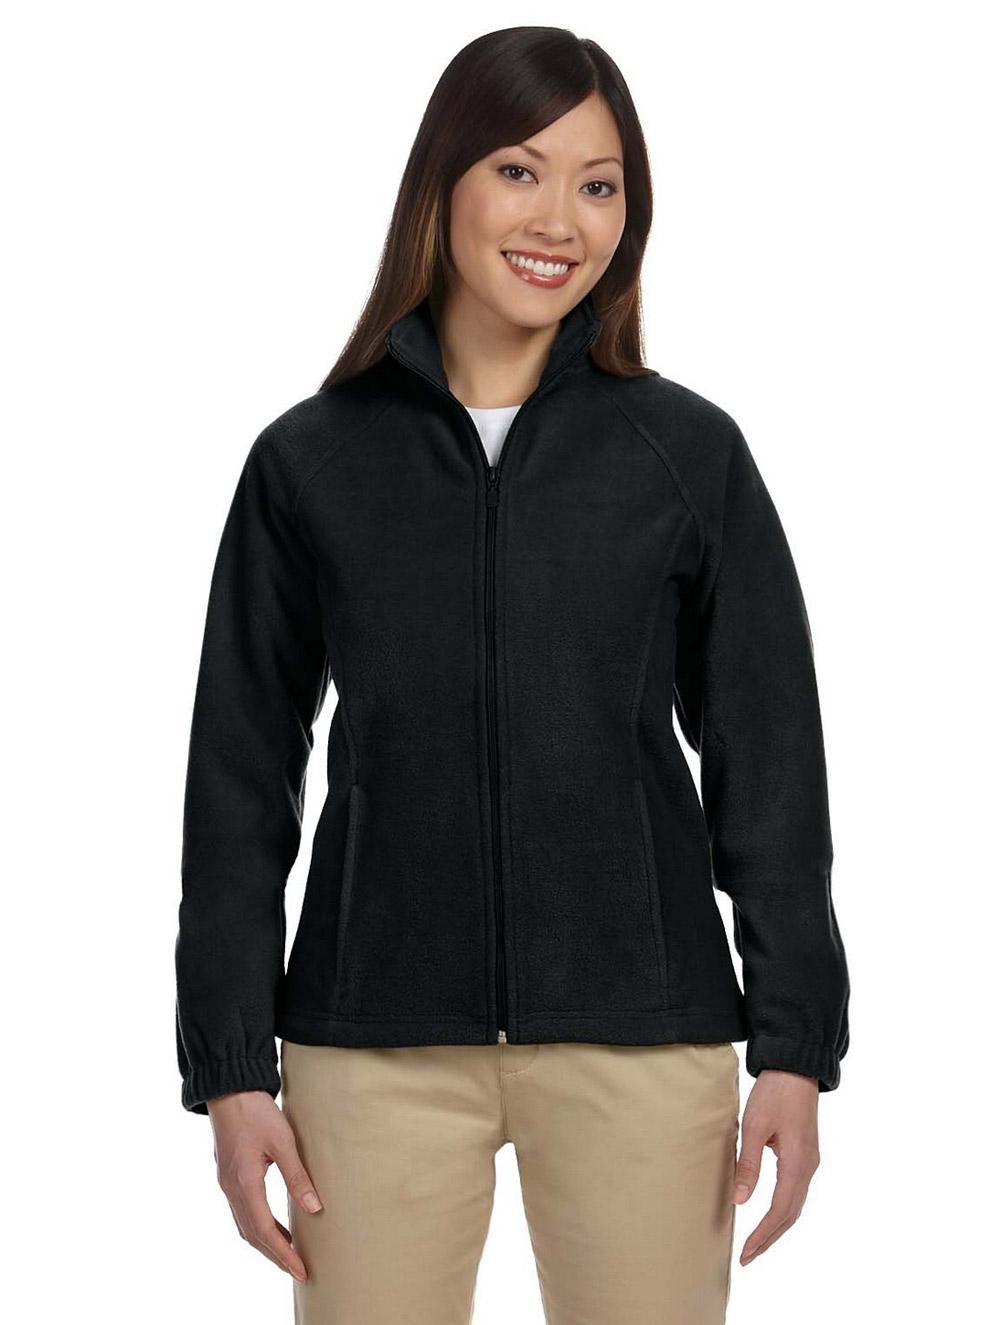 Ladies' 8 oz. Full-Zip Fleece w/ Logo Embroidery